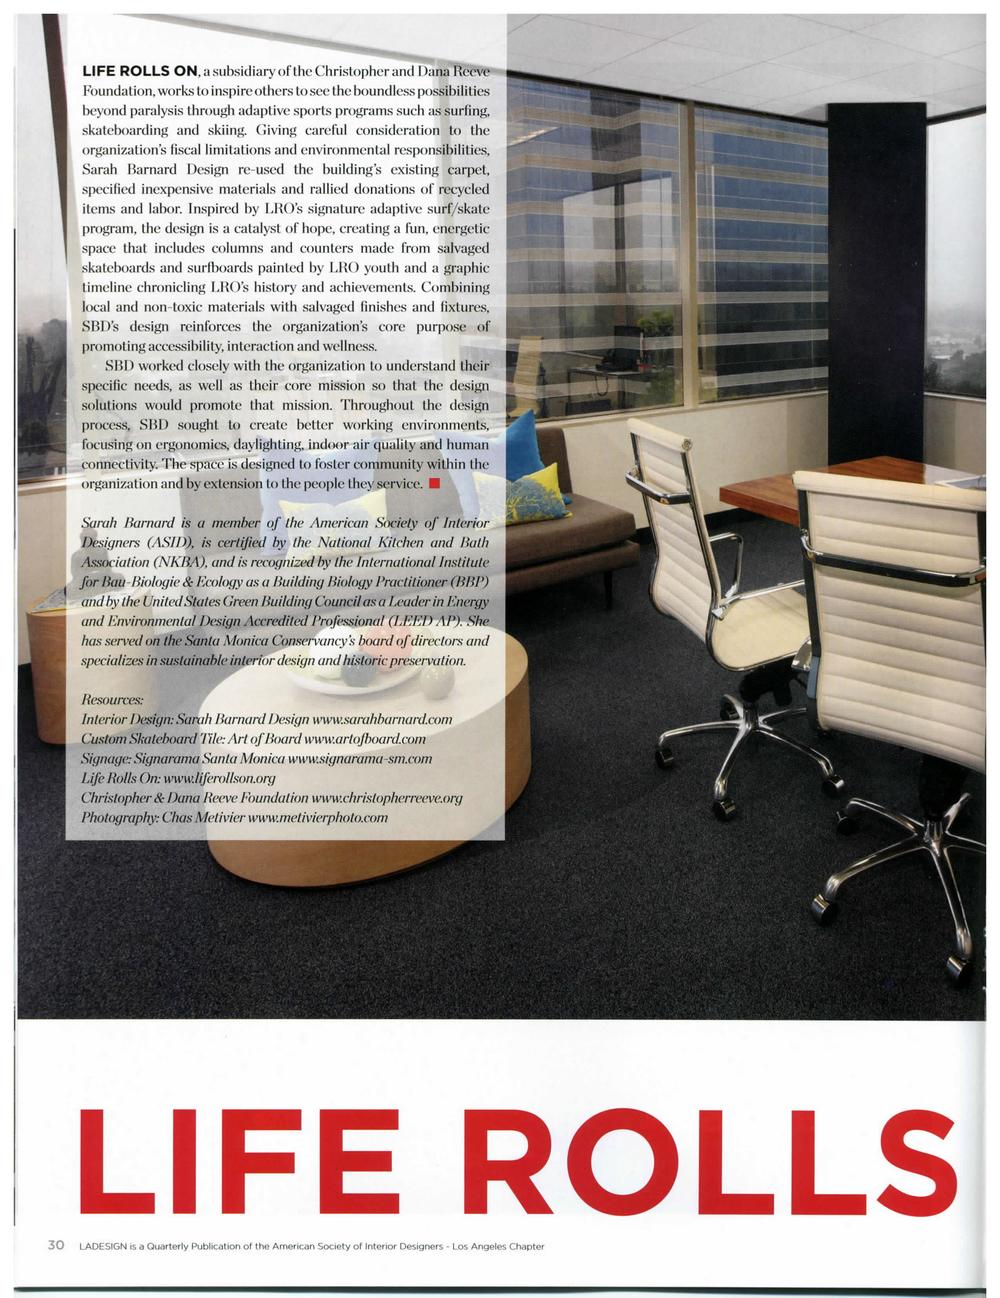 Burnett, Cindi.  Repurposed/Renewal. Life Rolls On.  LADESIGN Magazine. P30-31. June 2016.